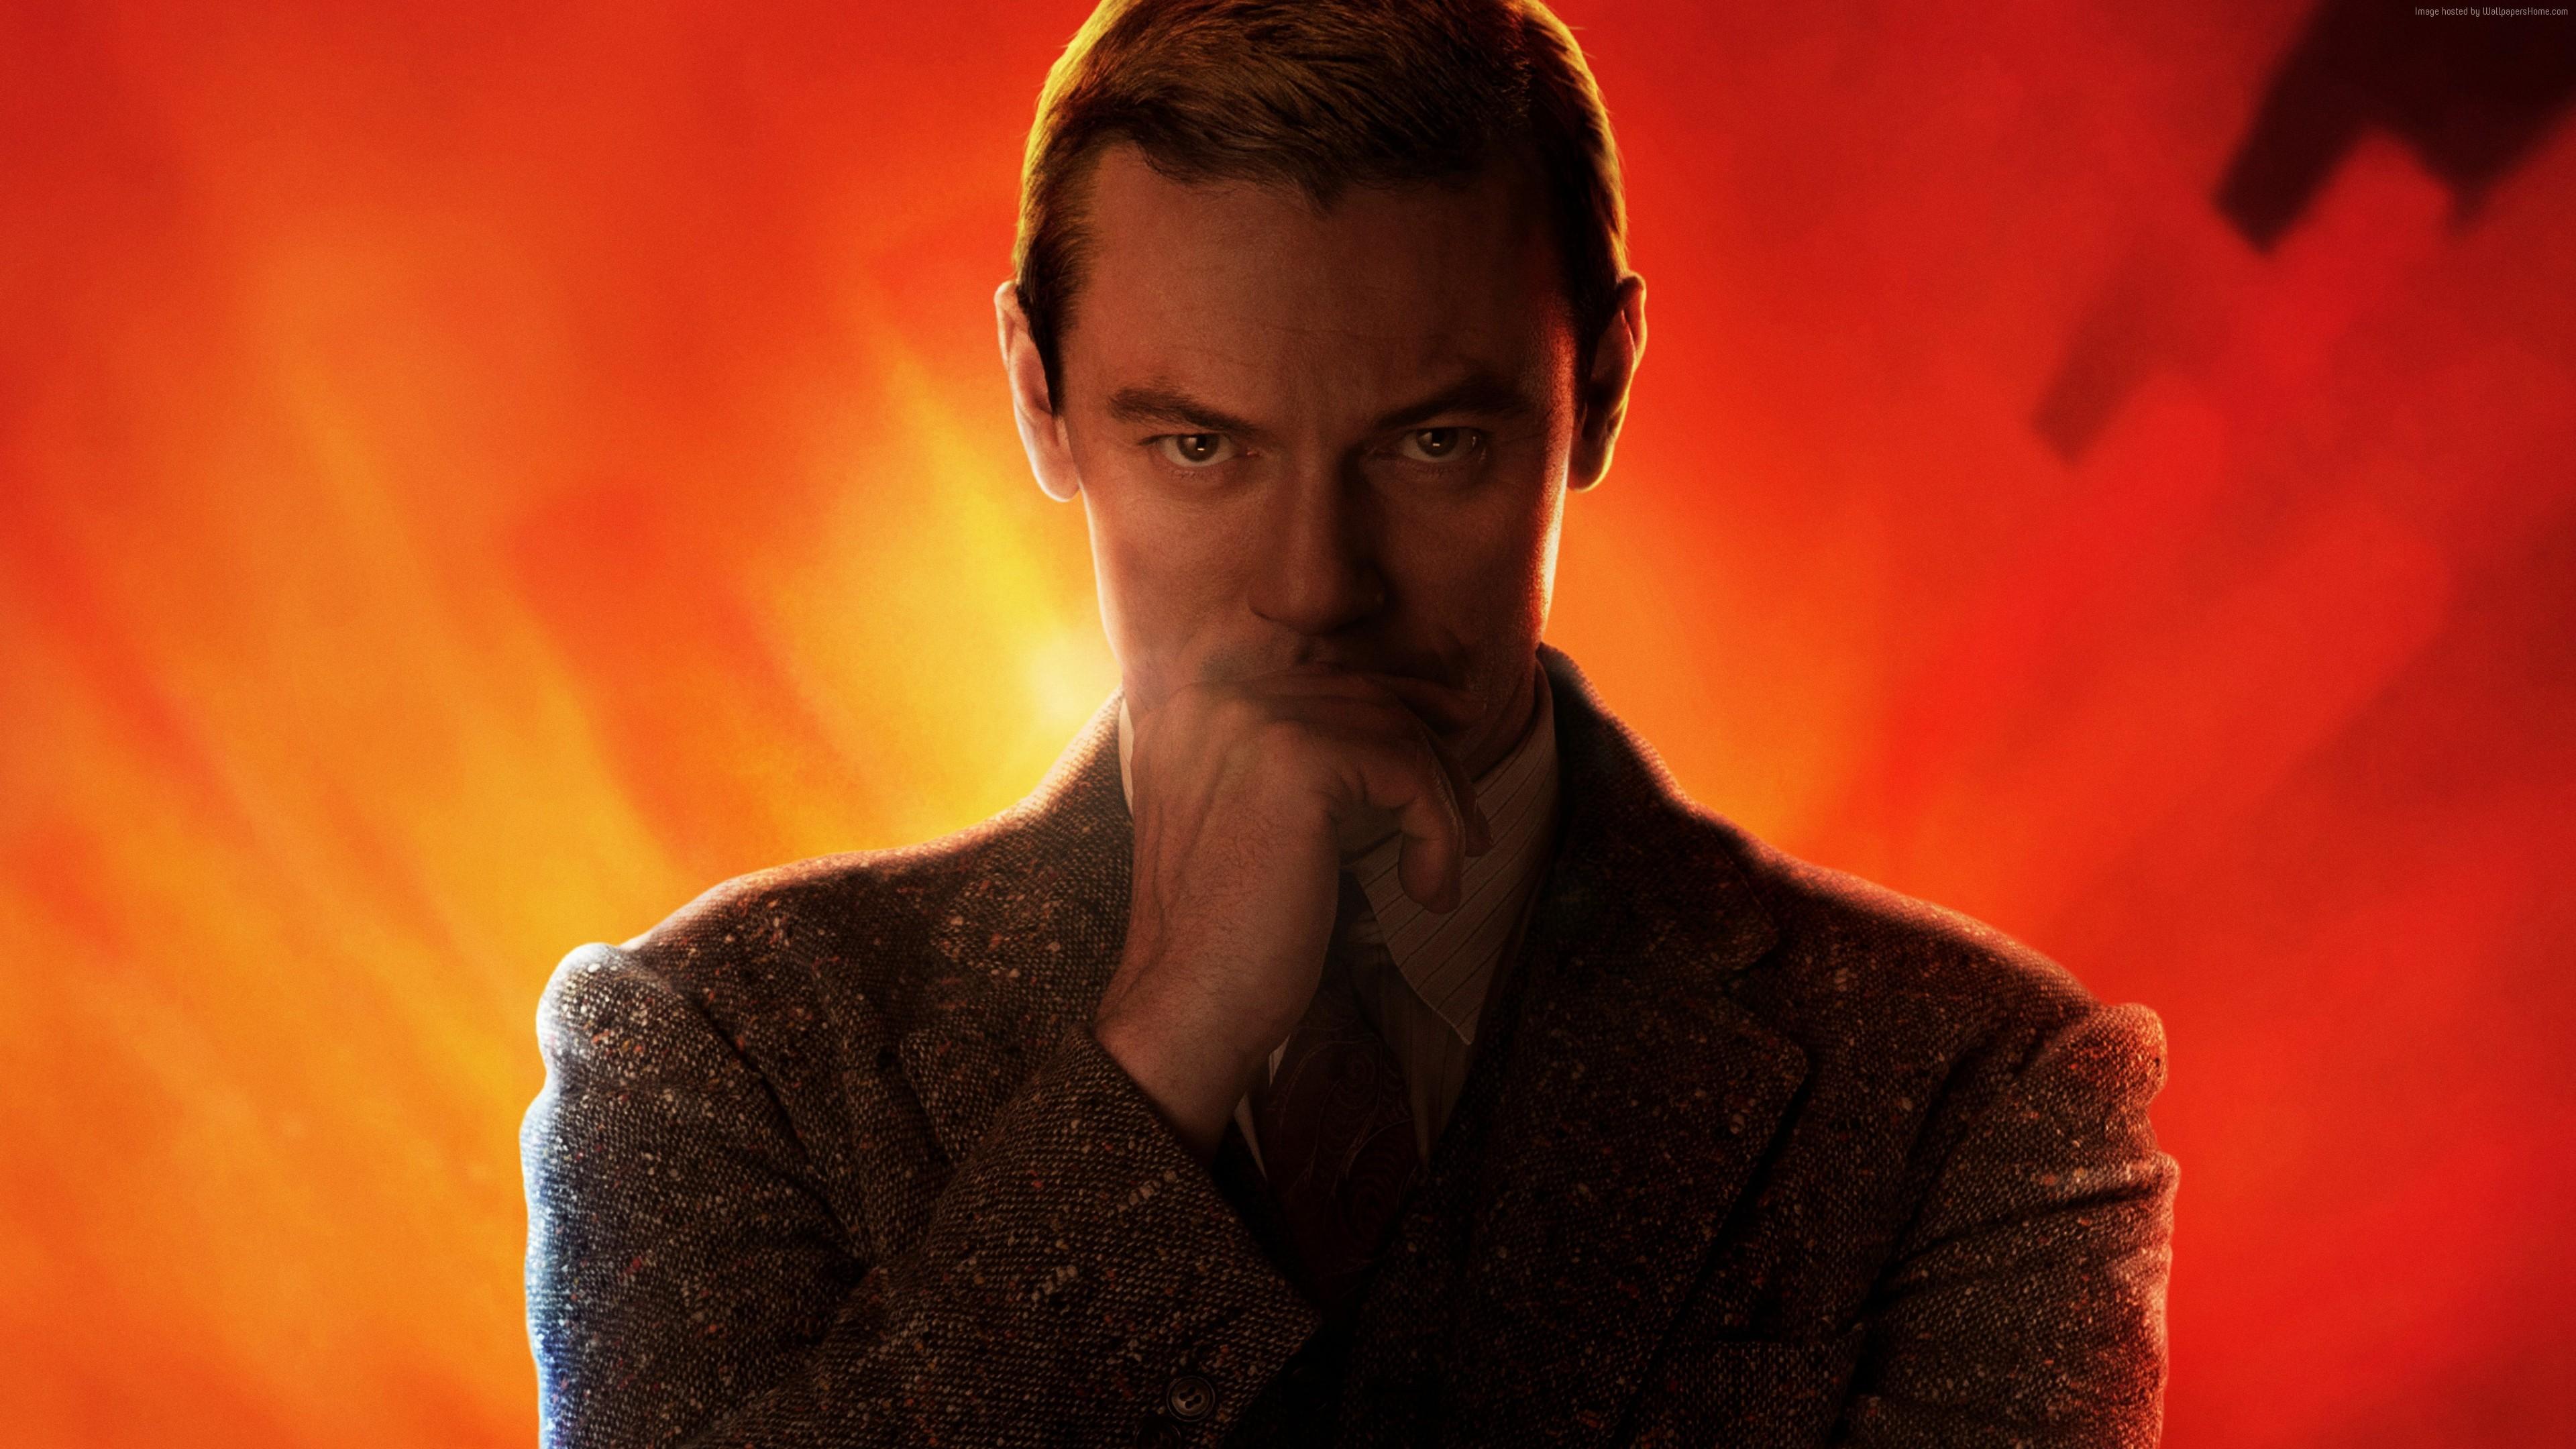 Actor Luc Evans In The Film Professor Marston And Wonder